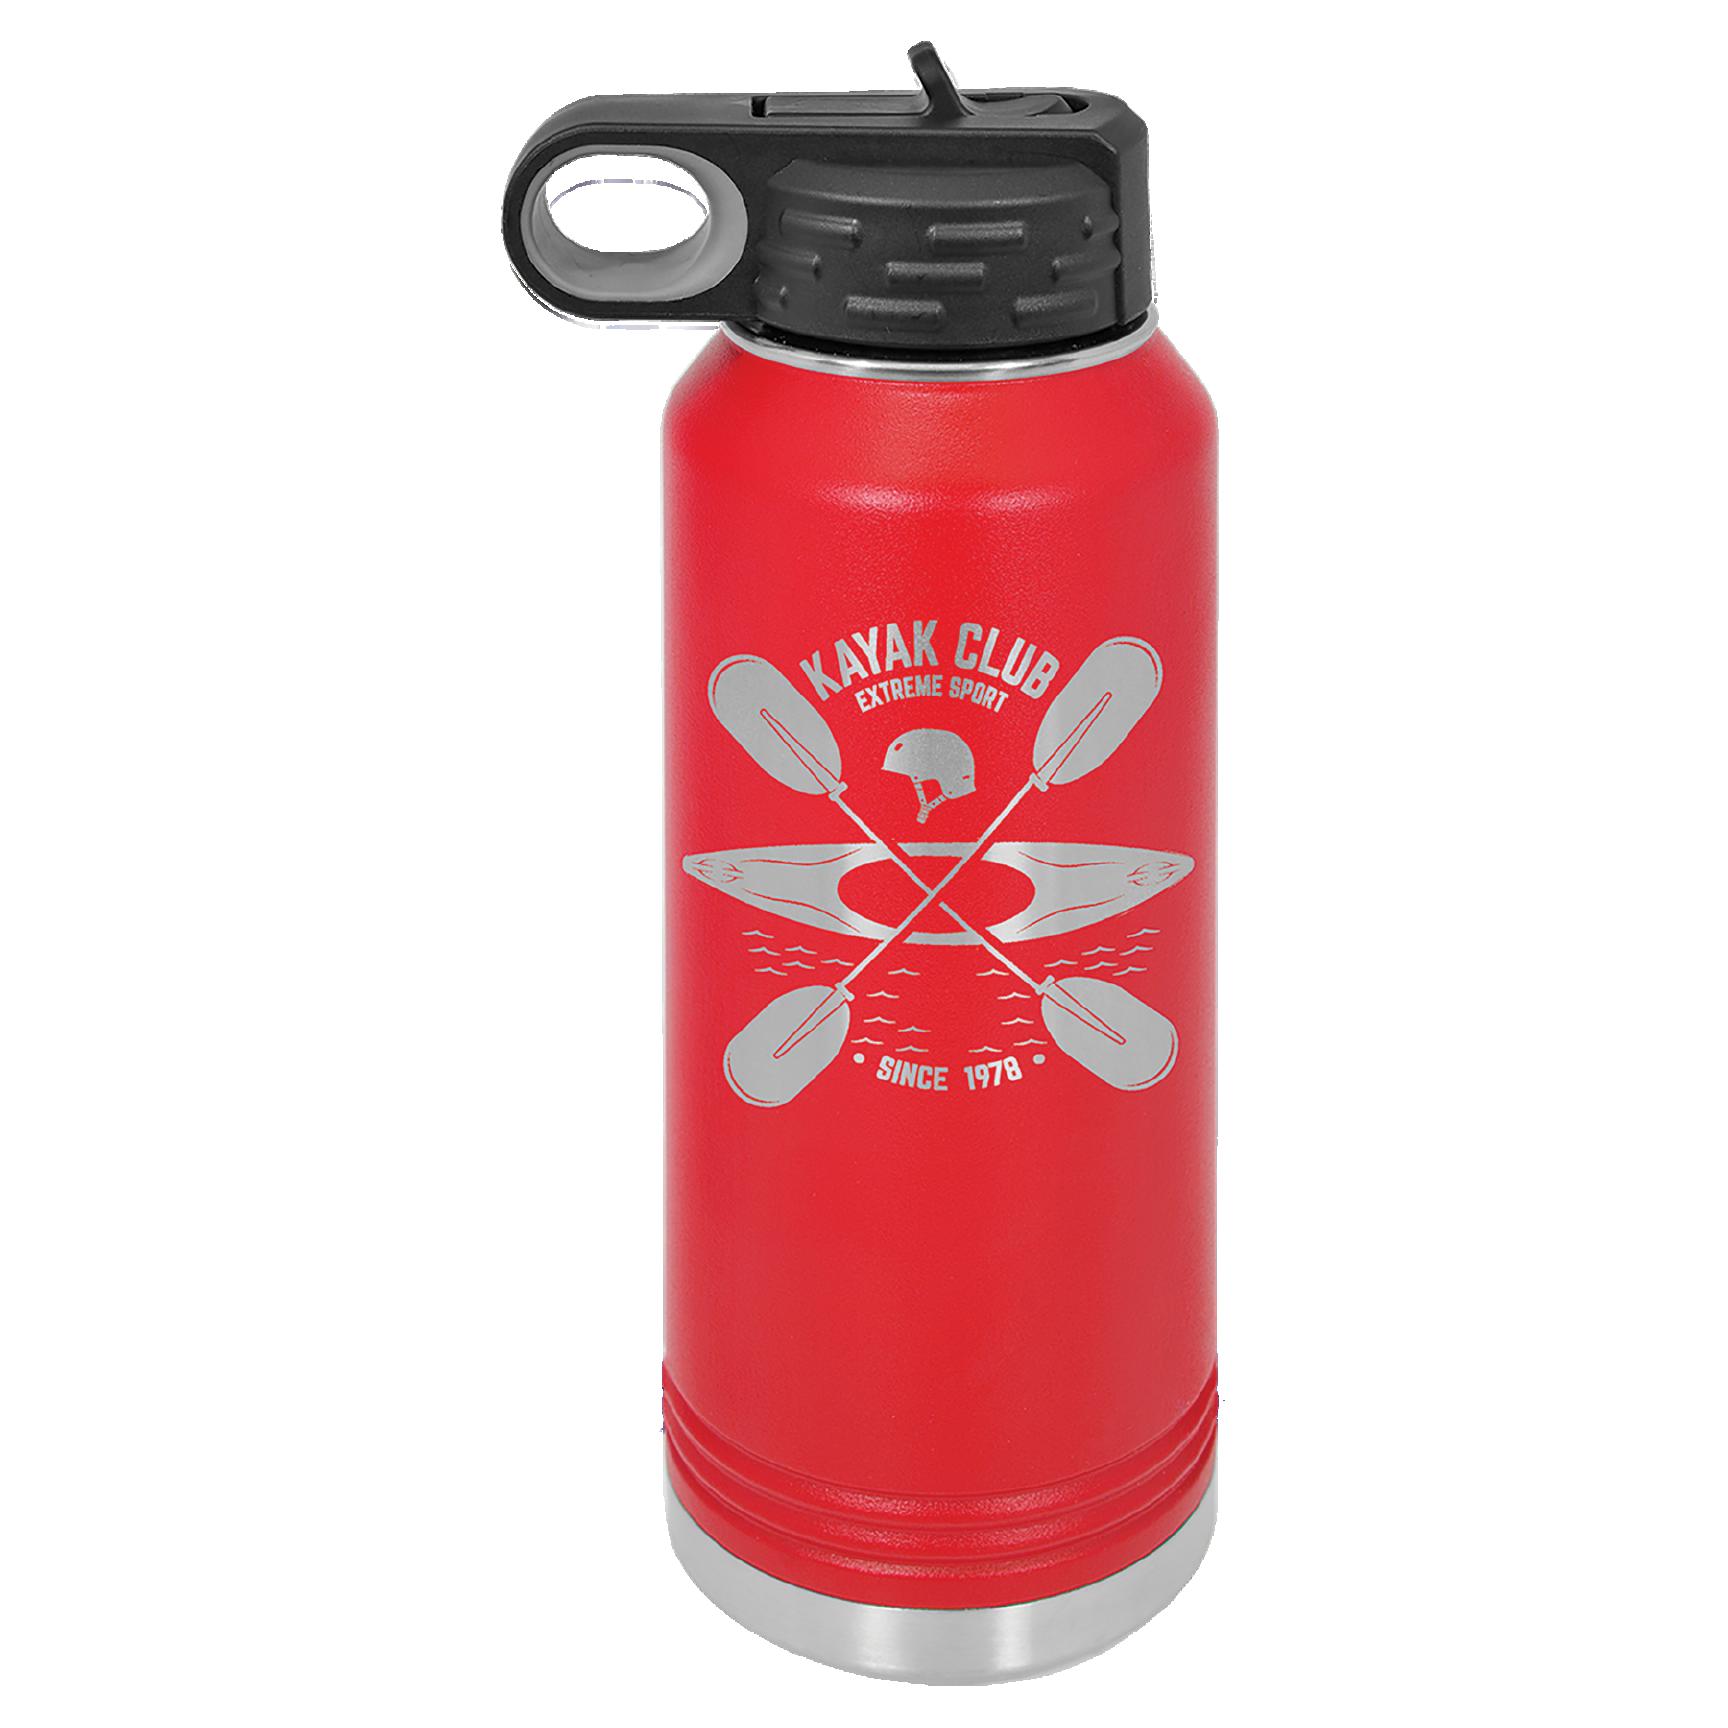 40 oz. Polar Camel Water Bottle (Copy) - Red